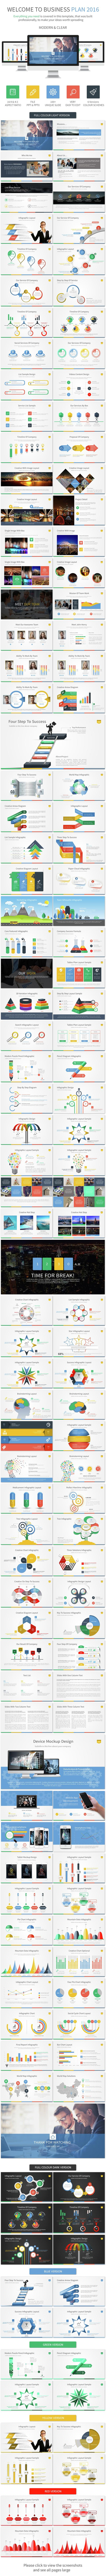 Business Plan 2016 Powerpoint Presentation Template